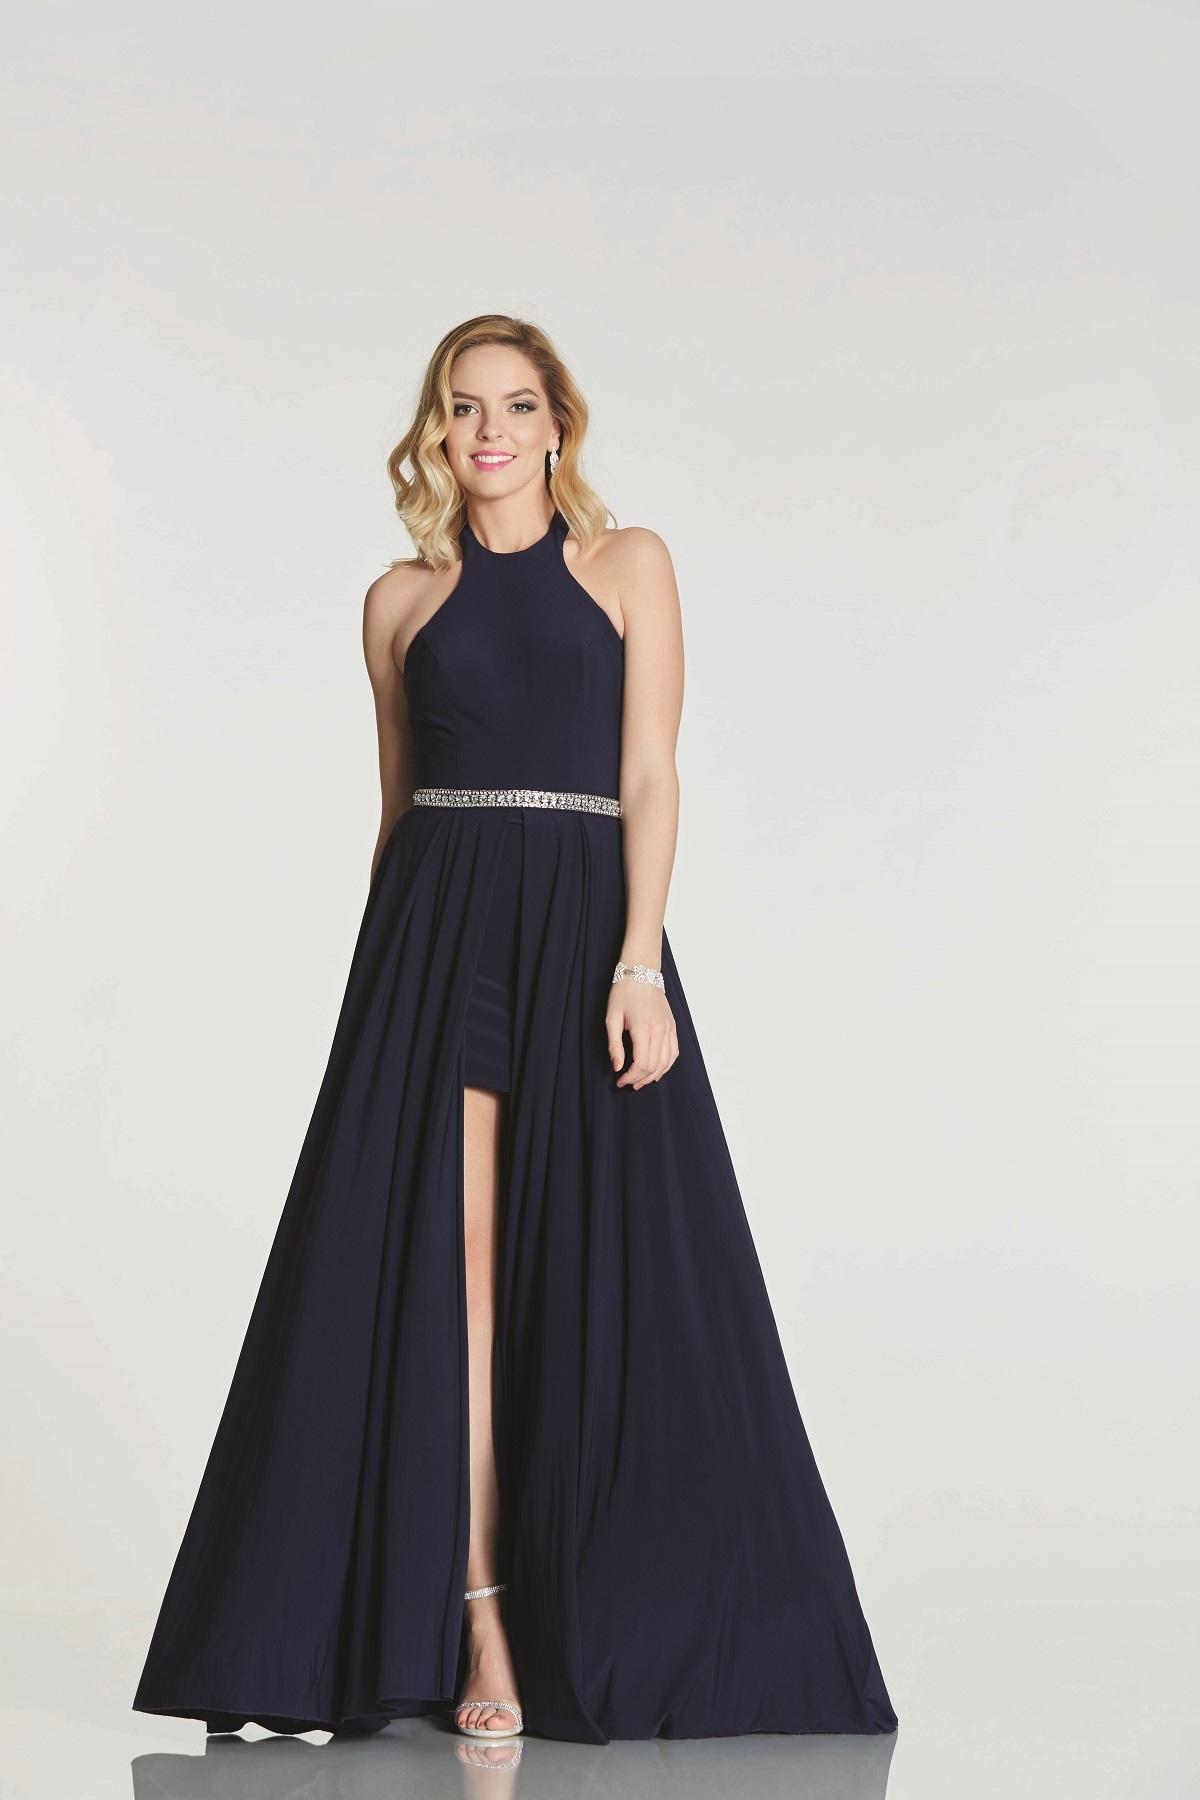 Illusion Prom Annabelle Stone 8 SALE Dressy Dresses